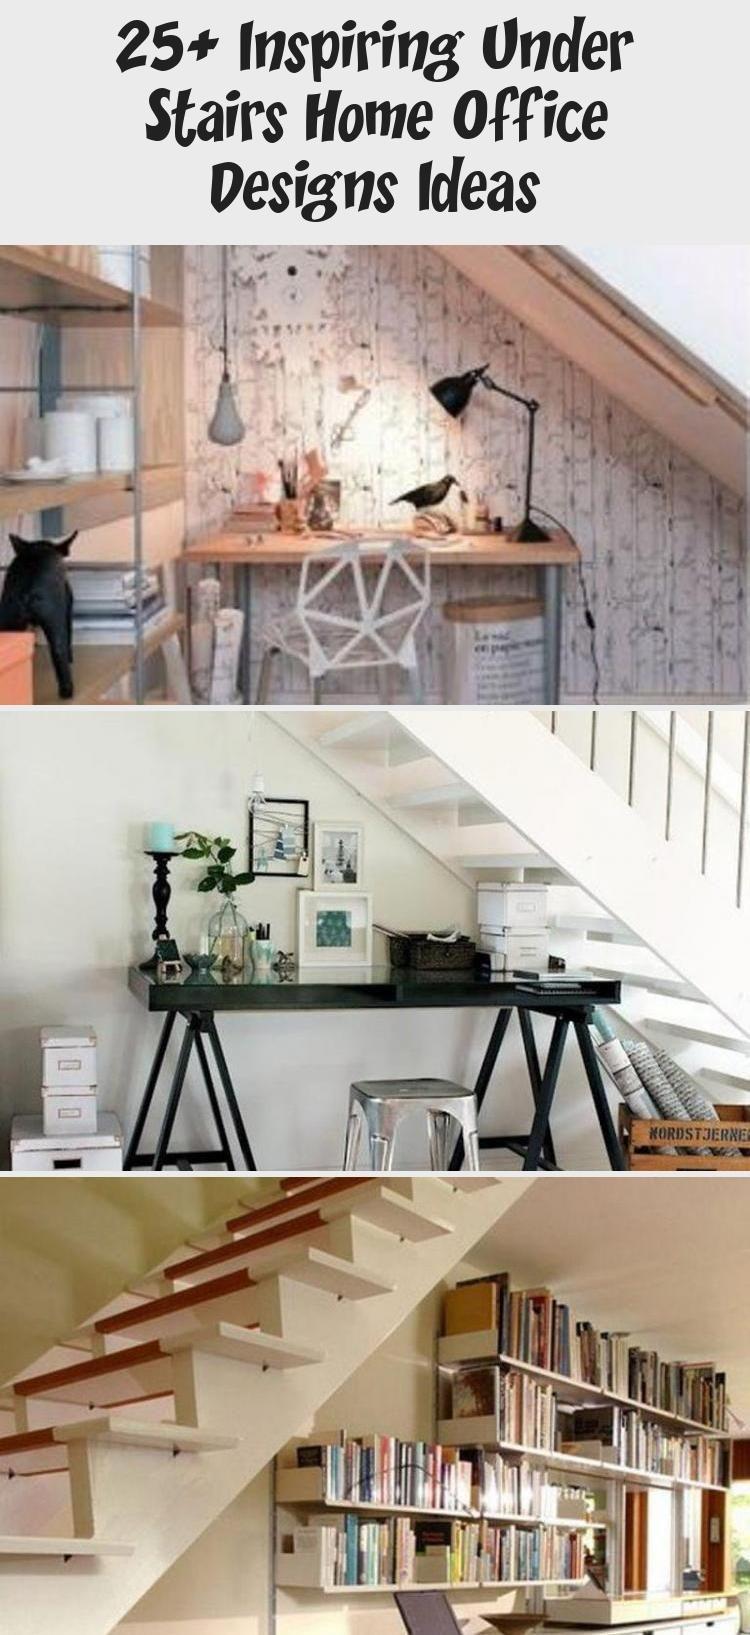 25 Inspiring Under Stairs Home Office Designs Ideas  Bilgi Tahtası